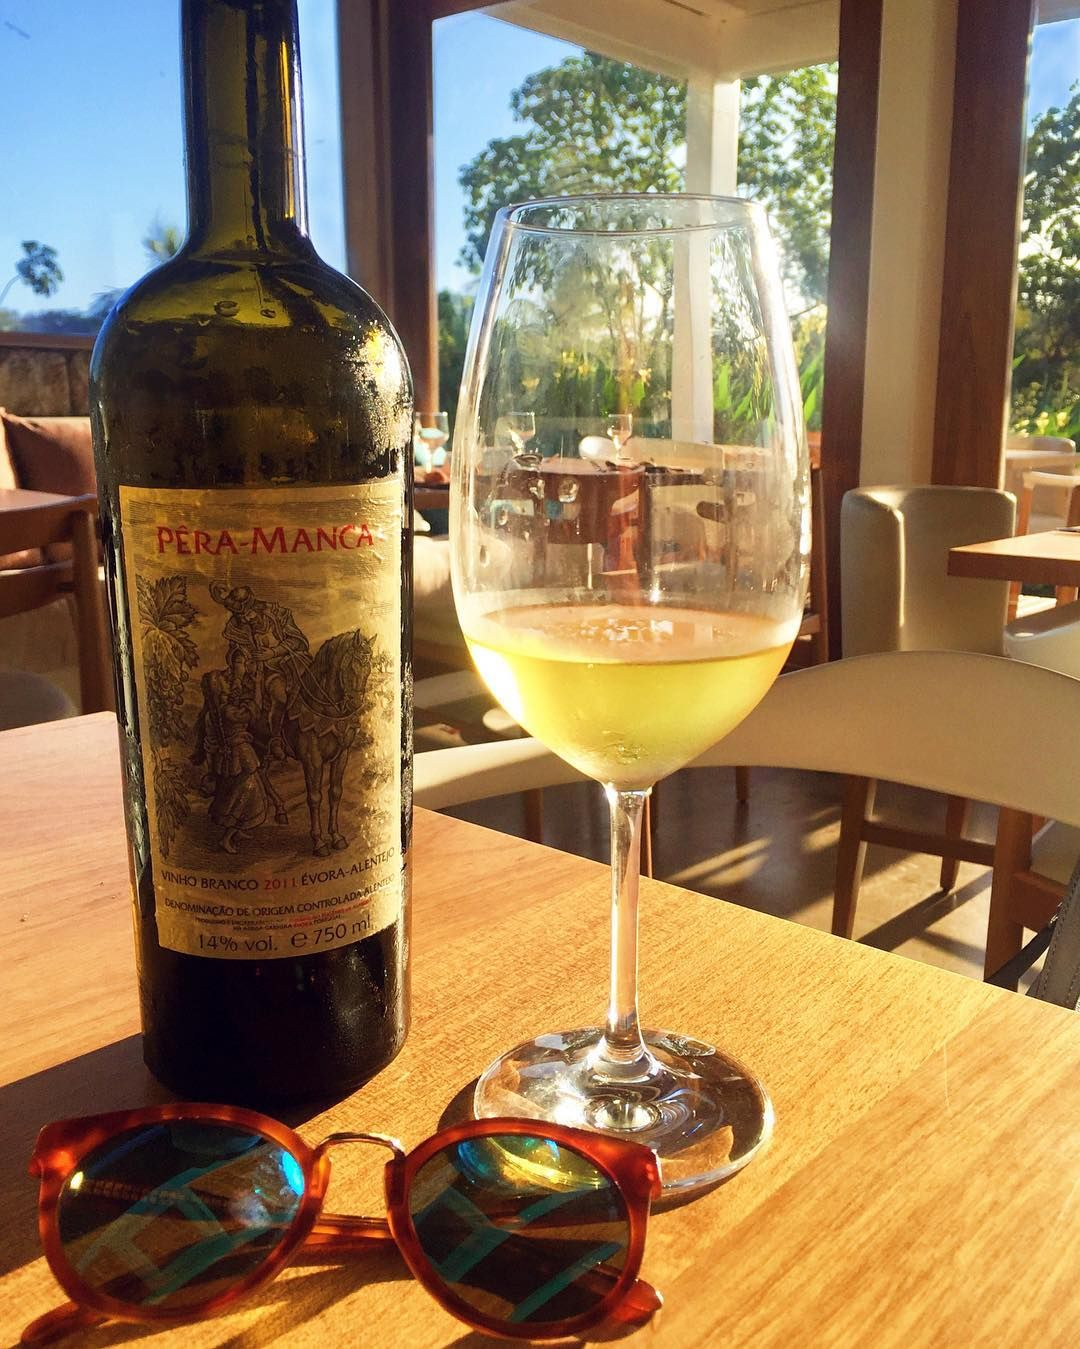 Cheers!  Sábado feliz por aqui comemorando as boas notícias  #saturdays #winelovers #fortaleza #paradise